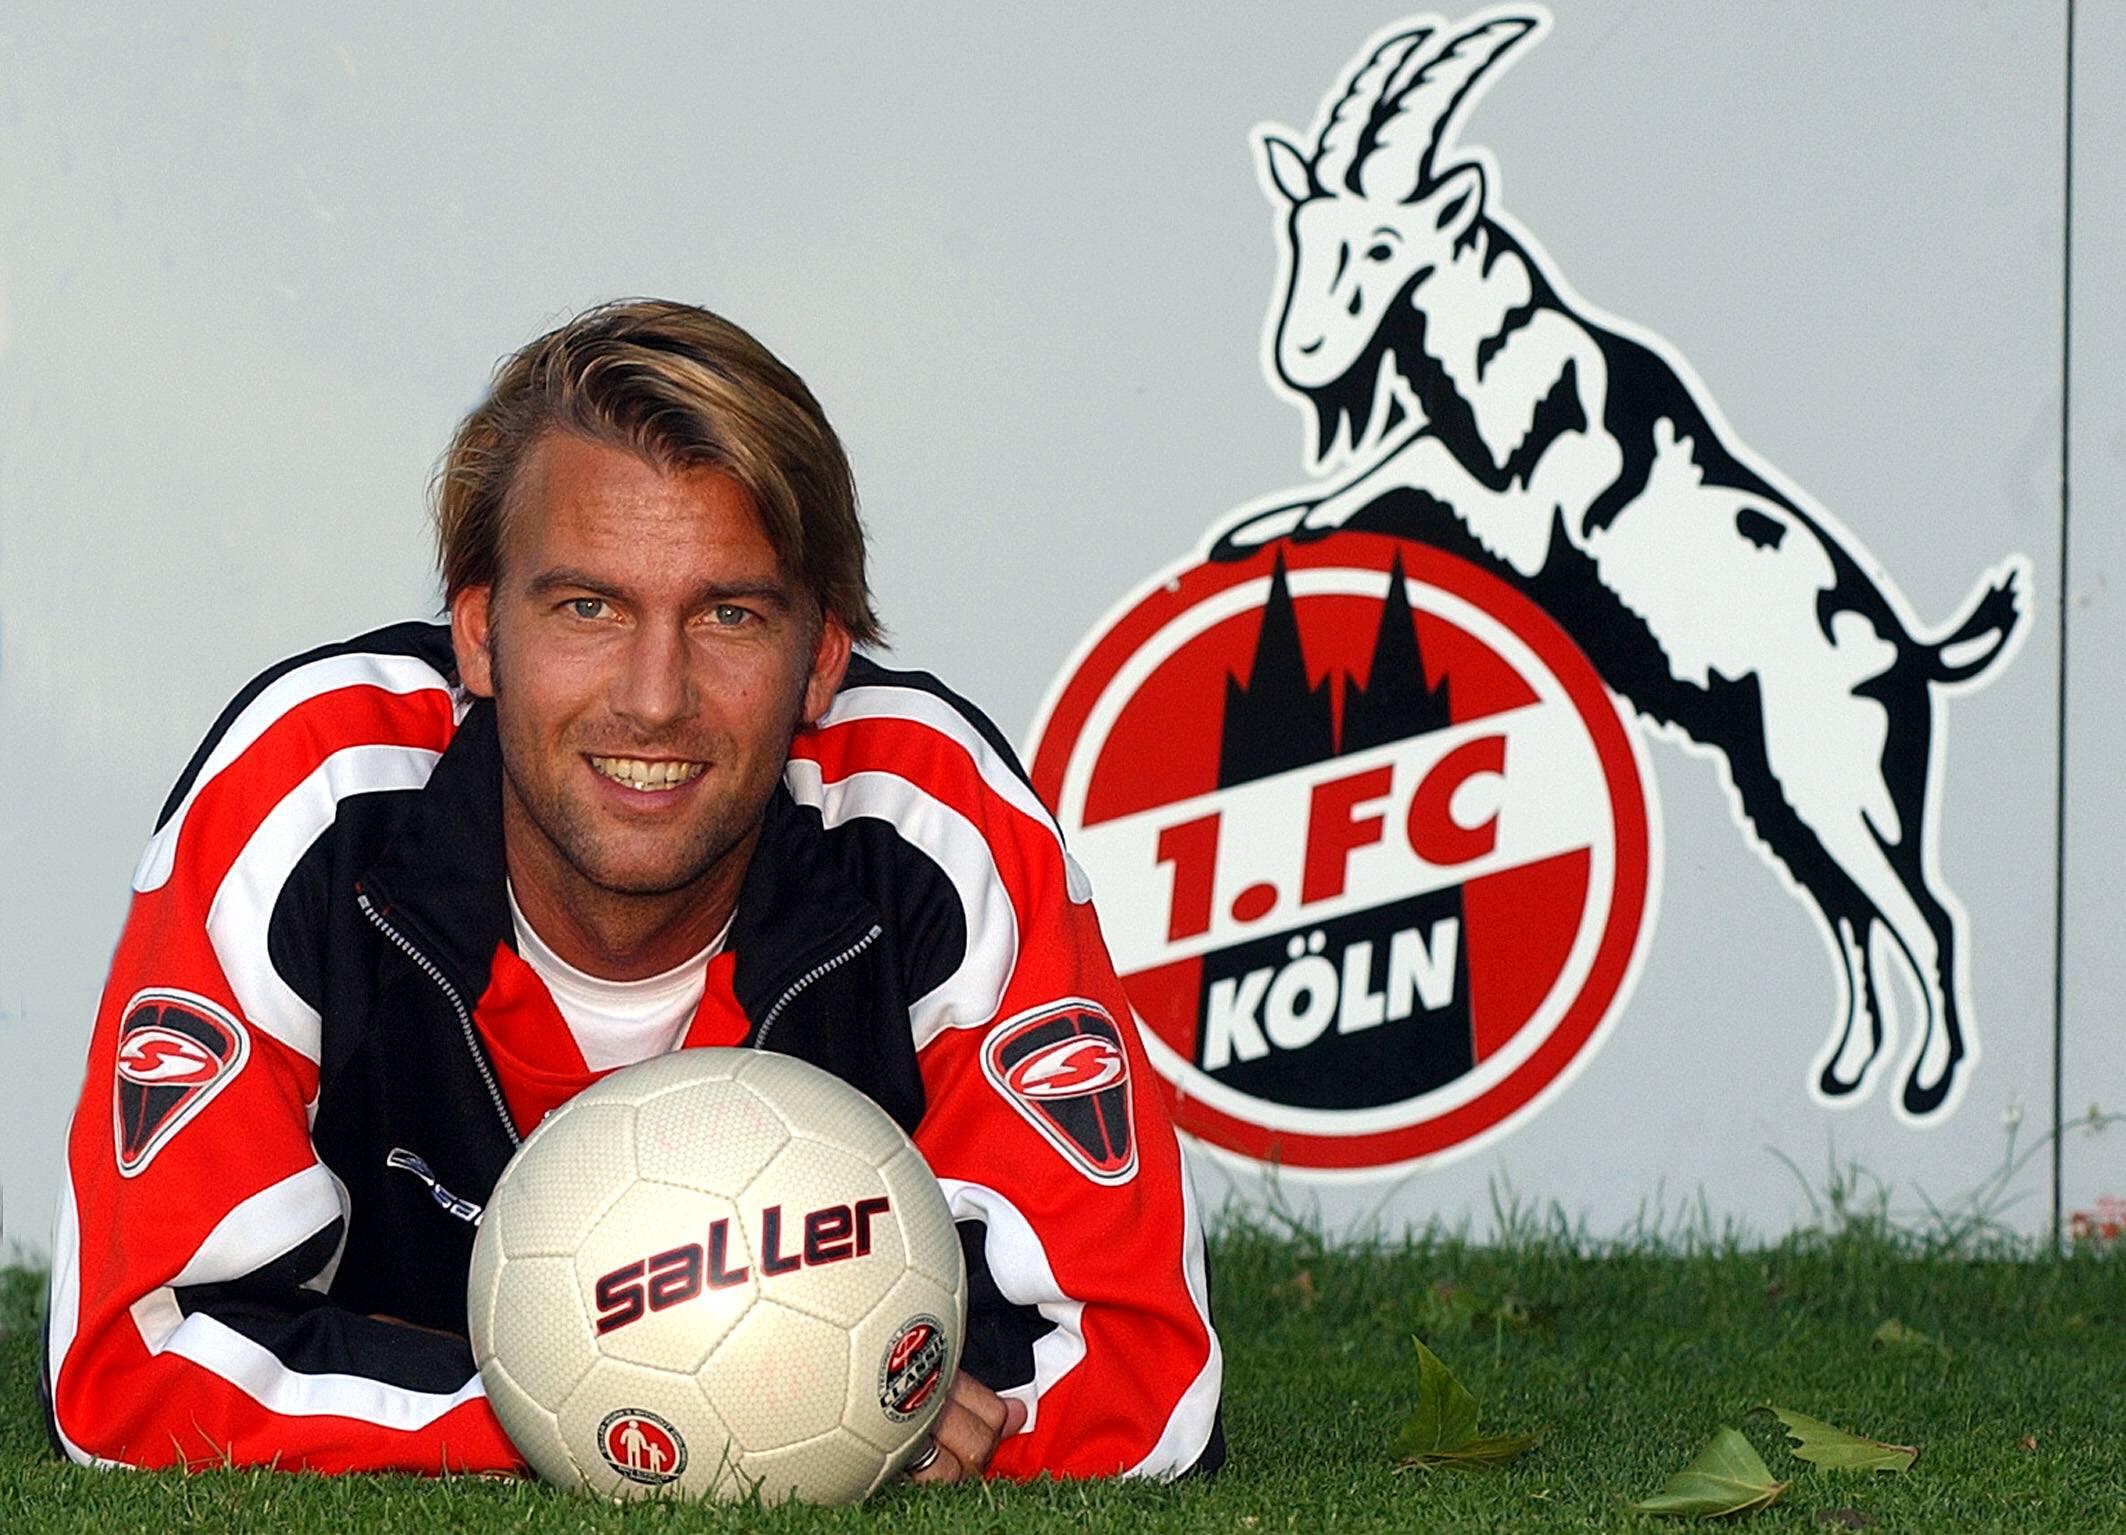 In Köln nur bei den Amateuren - Lars Leese.